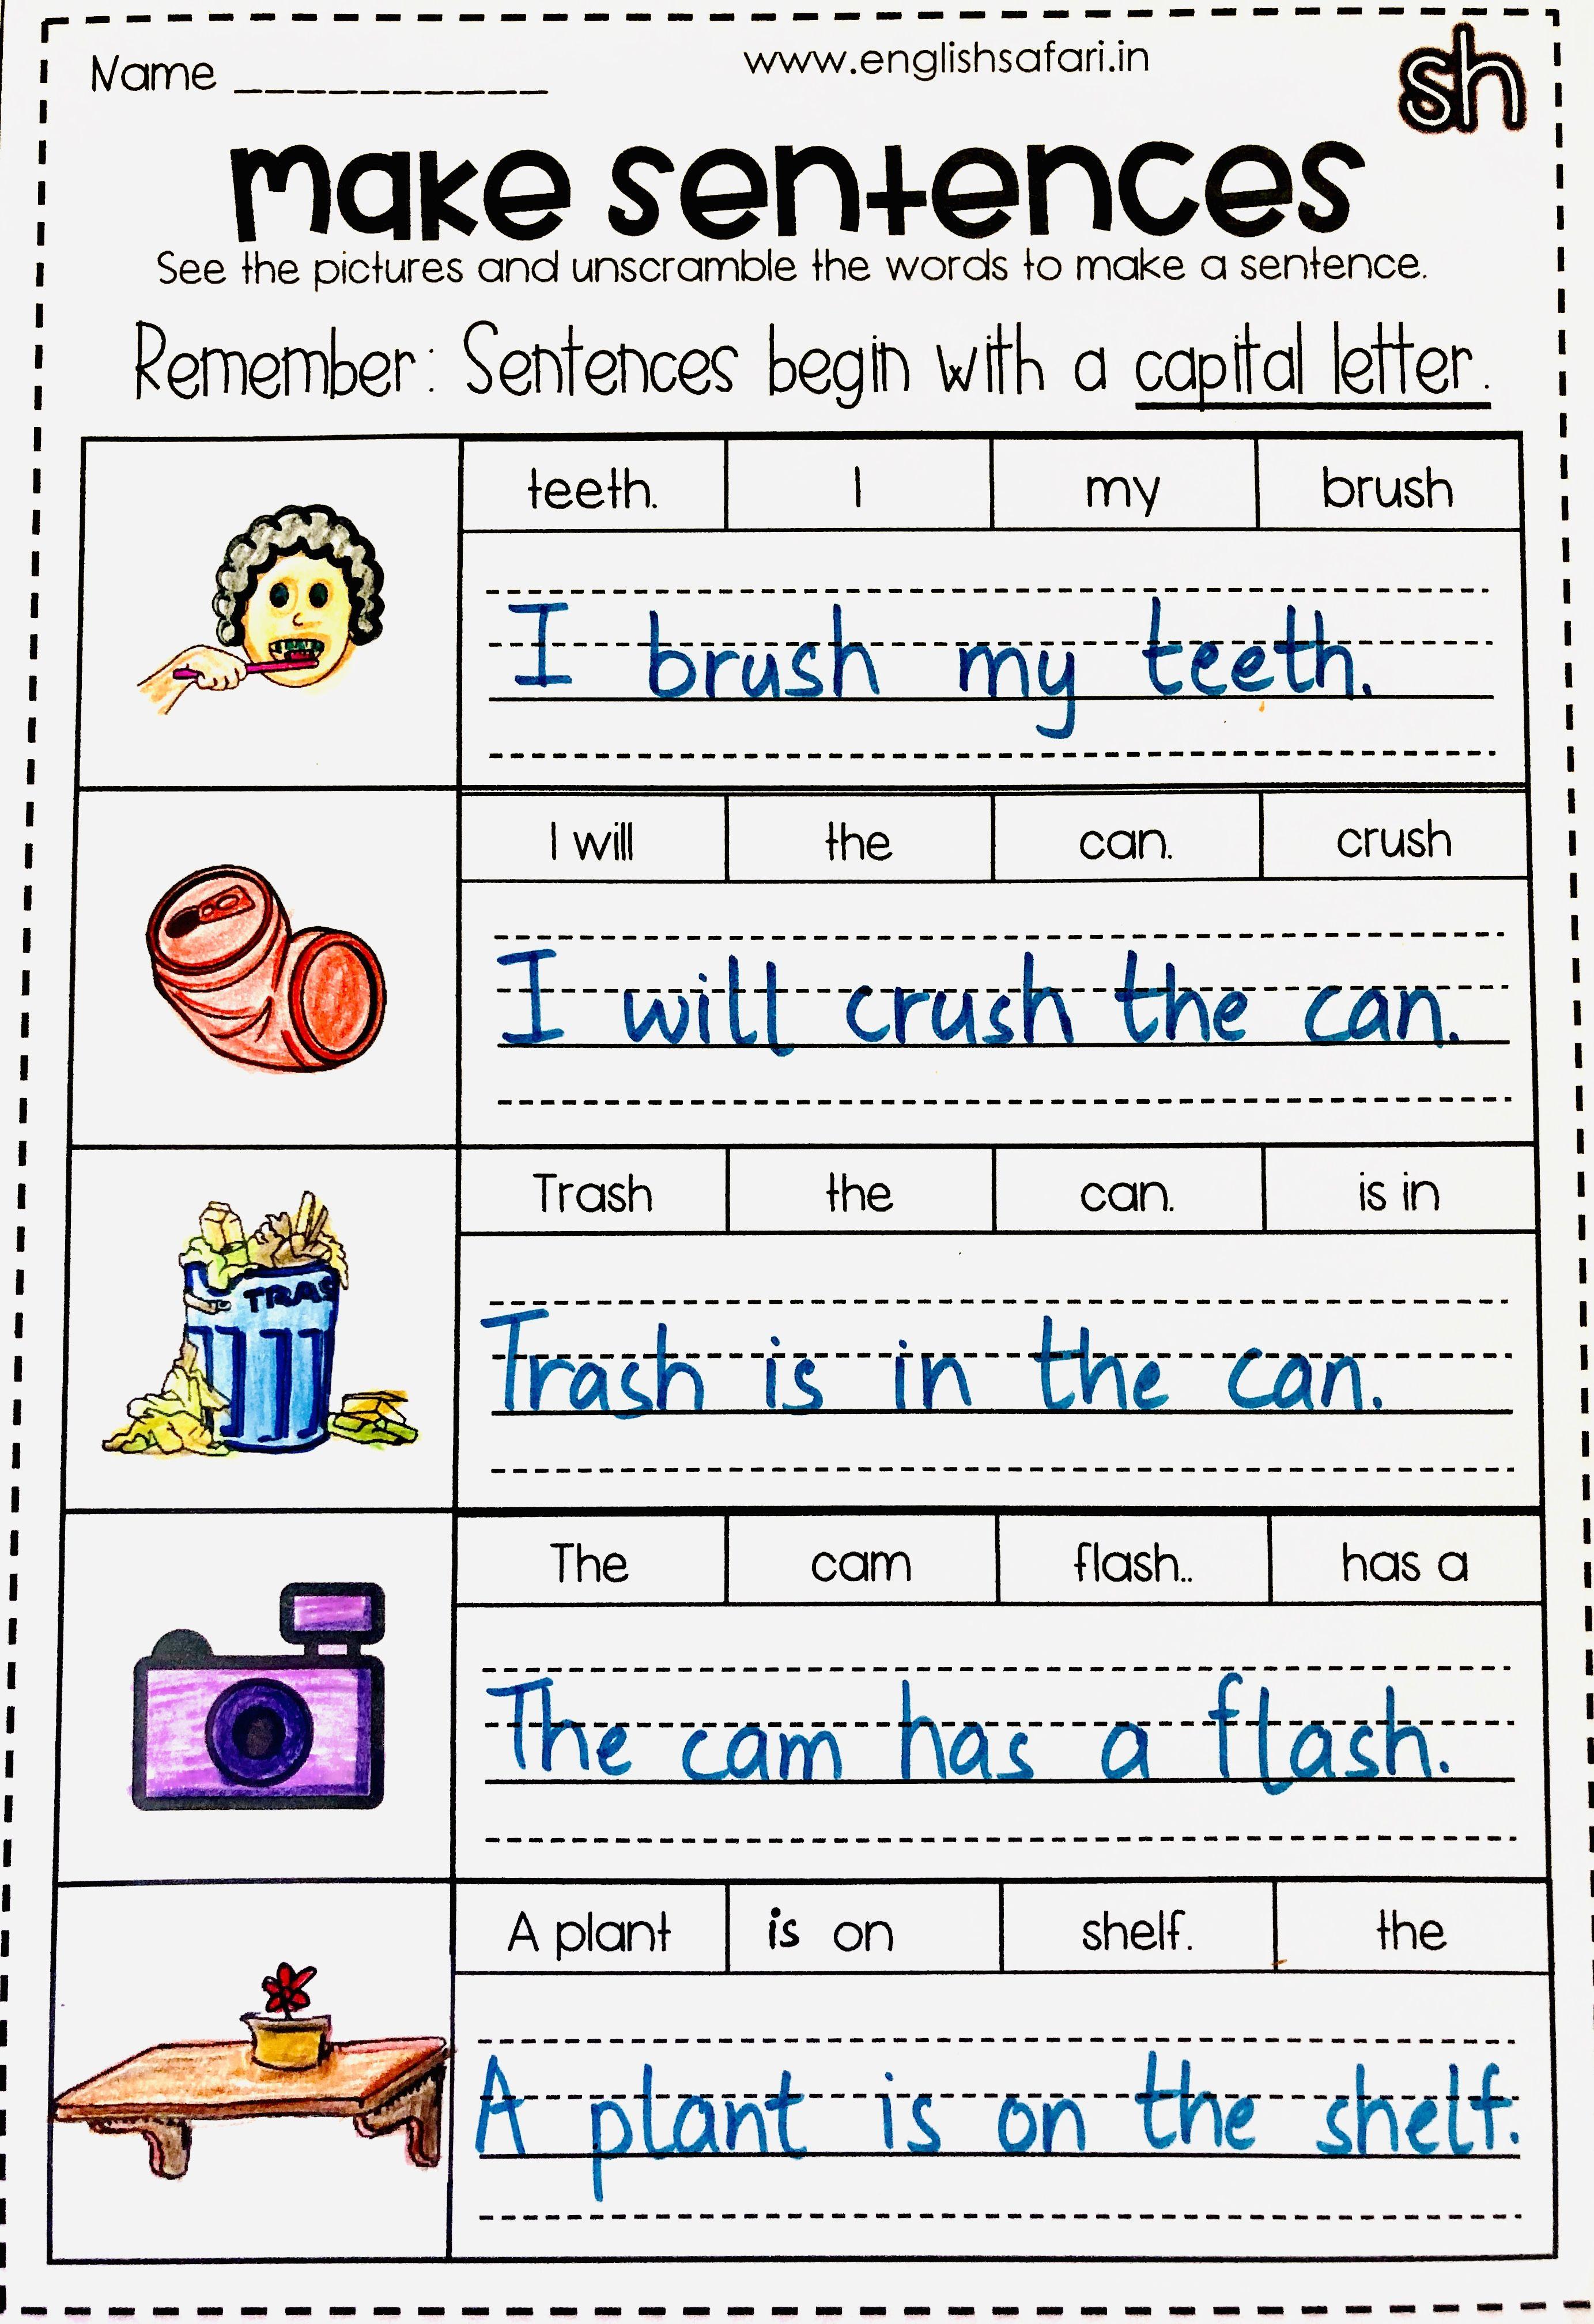 Make Sentences Using These Words Englishsafari In